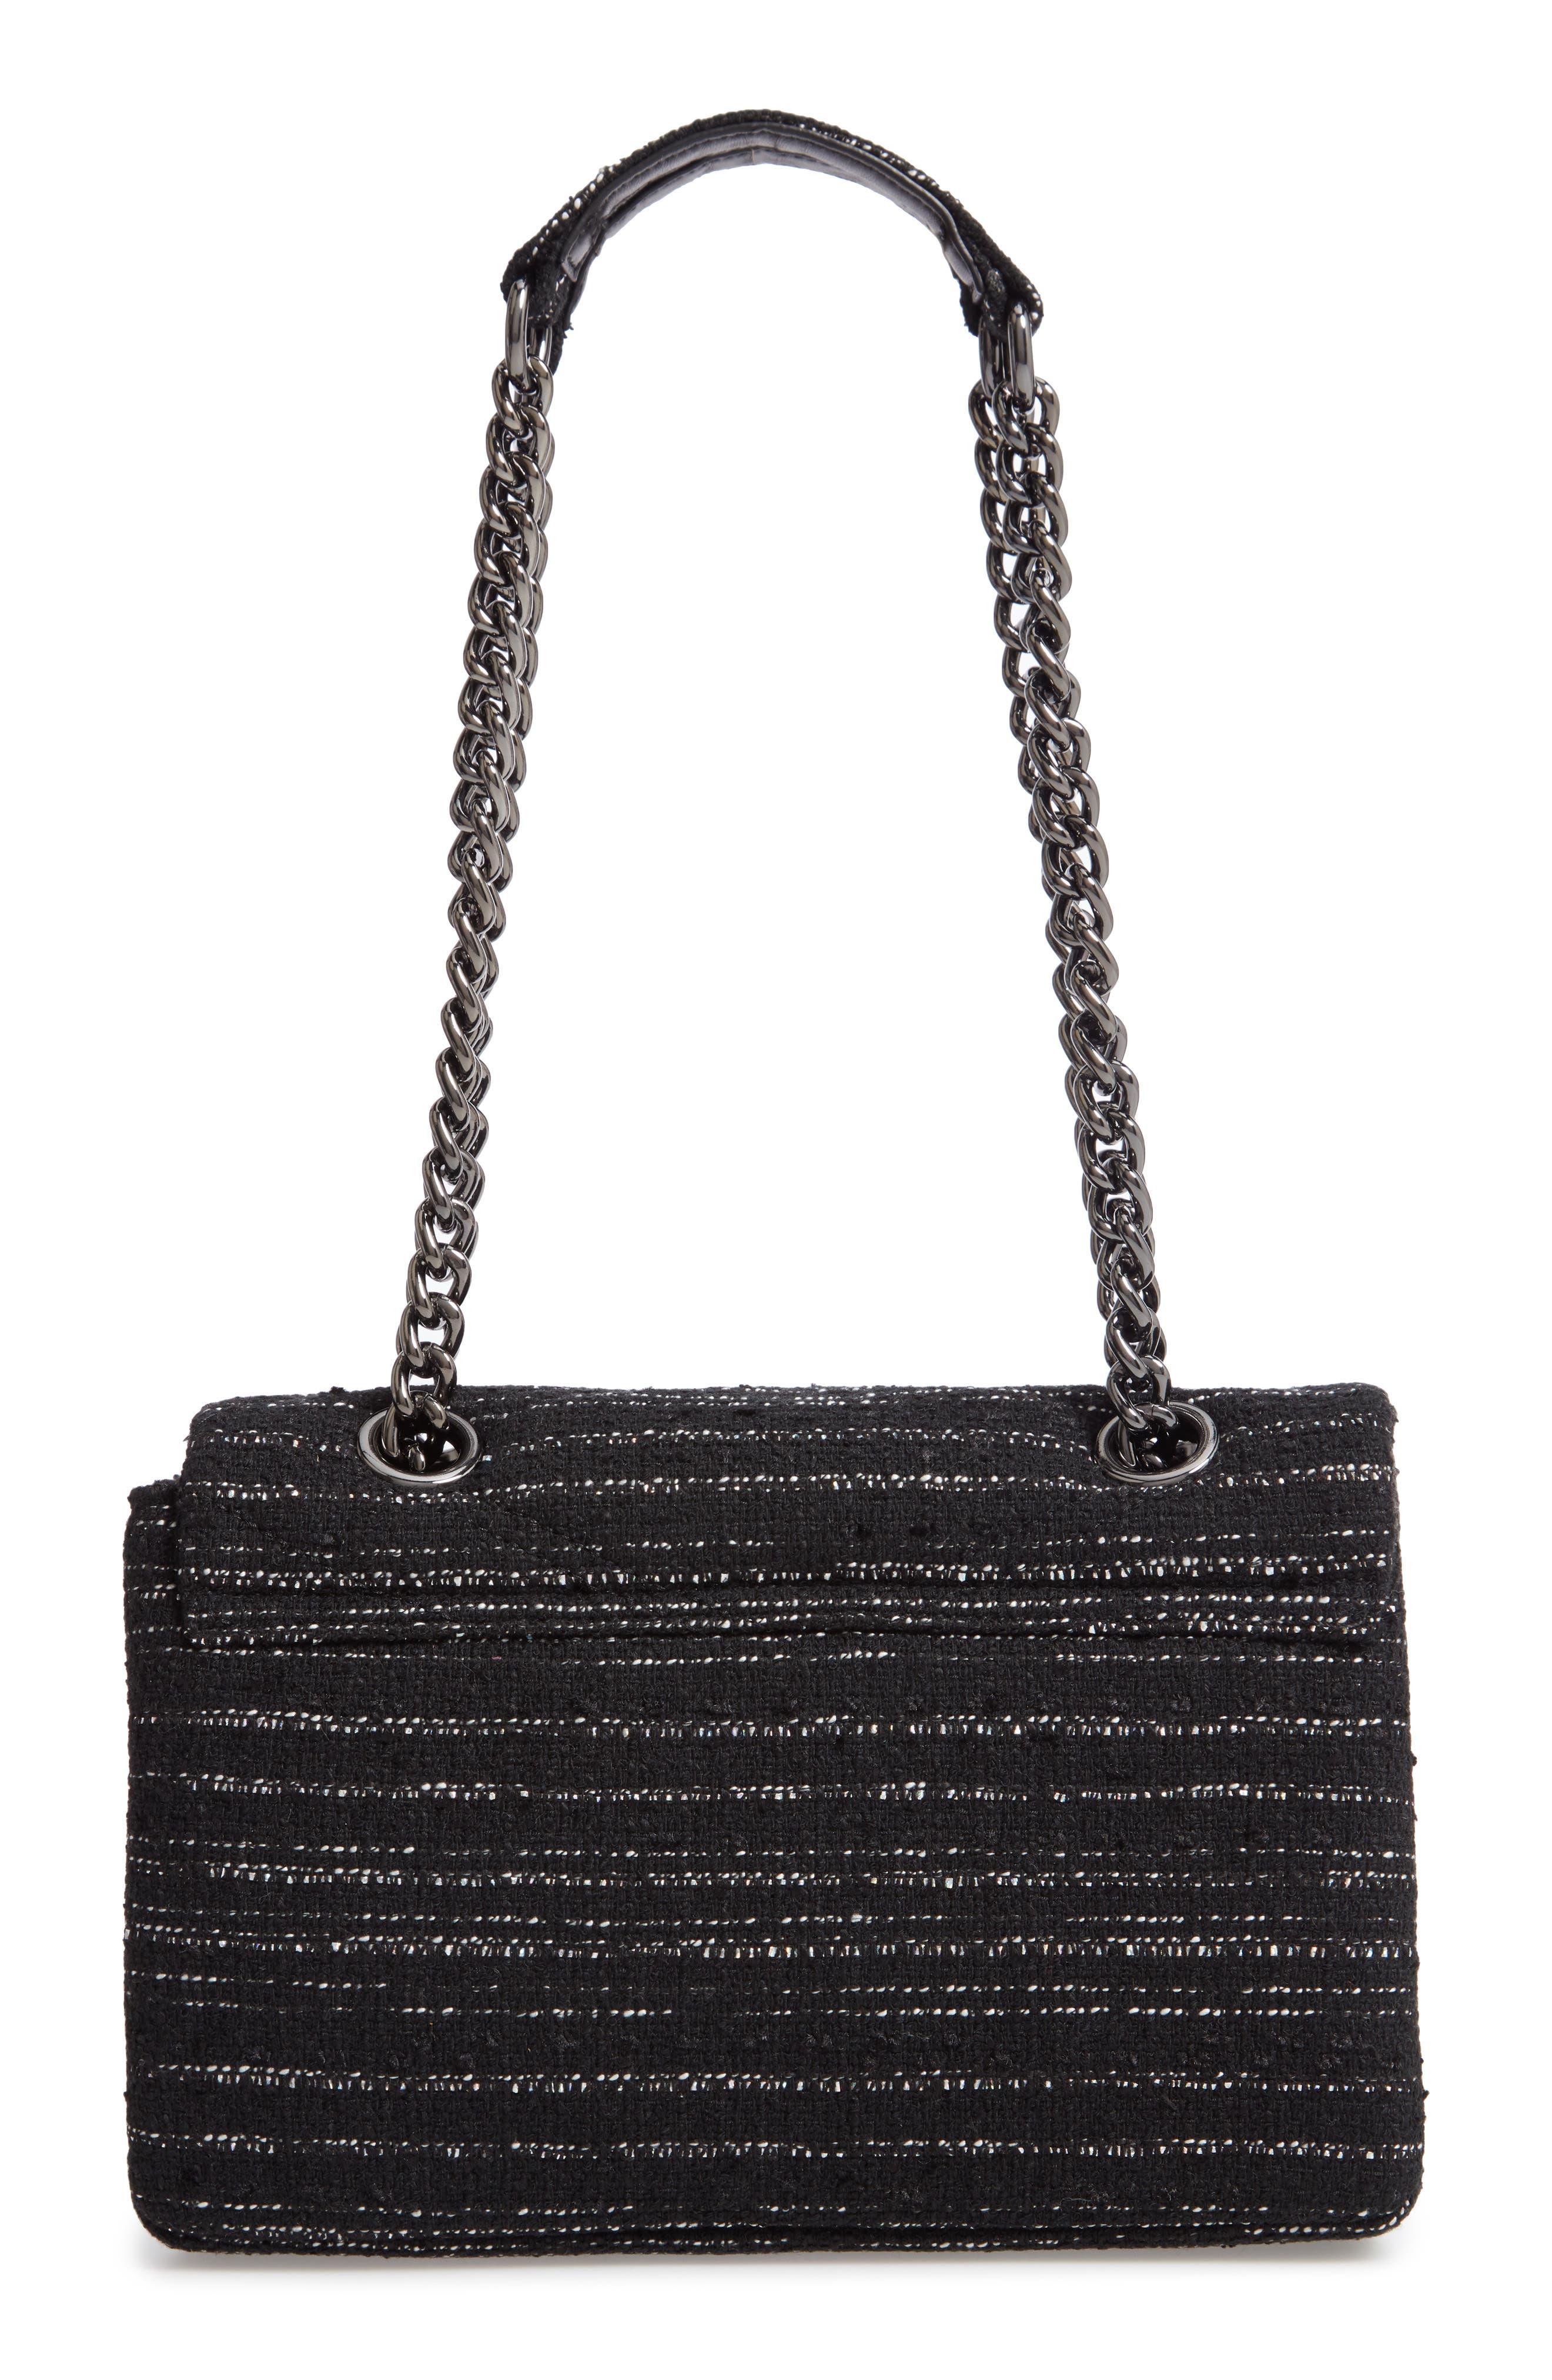 Mayfair Quilted Tweed Shoulder Bag,                             Alternate thumbnail 3, color,                             BLACK